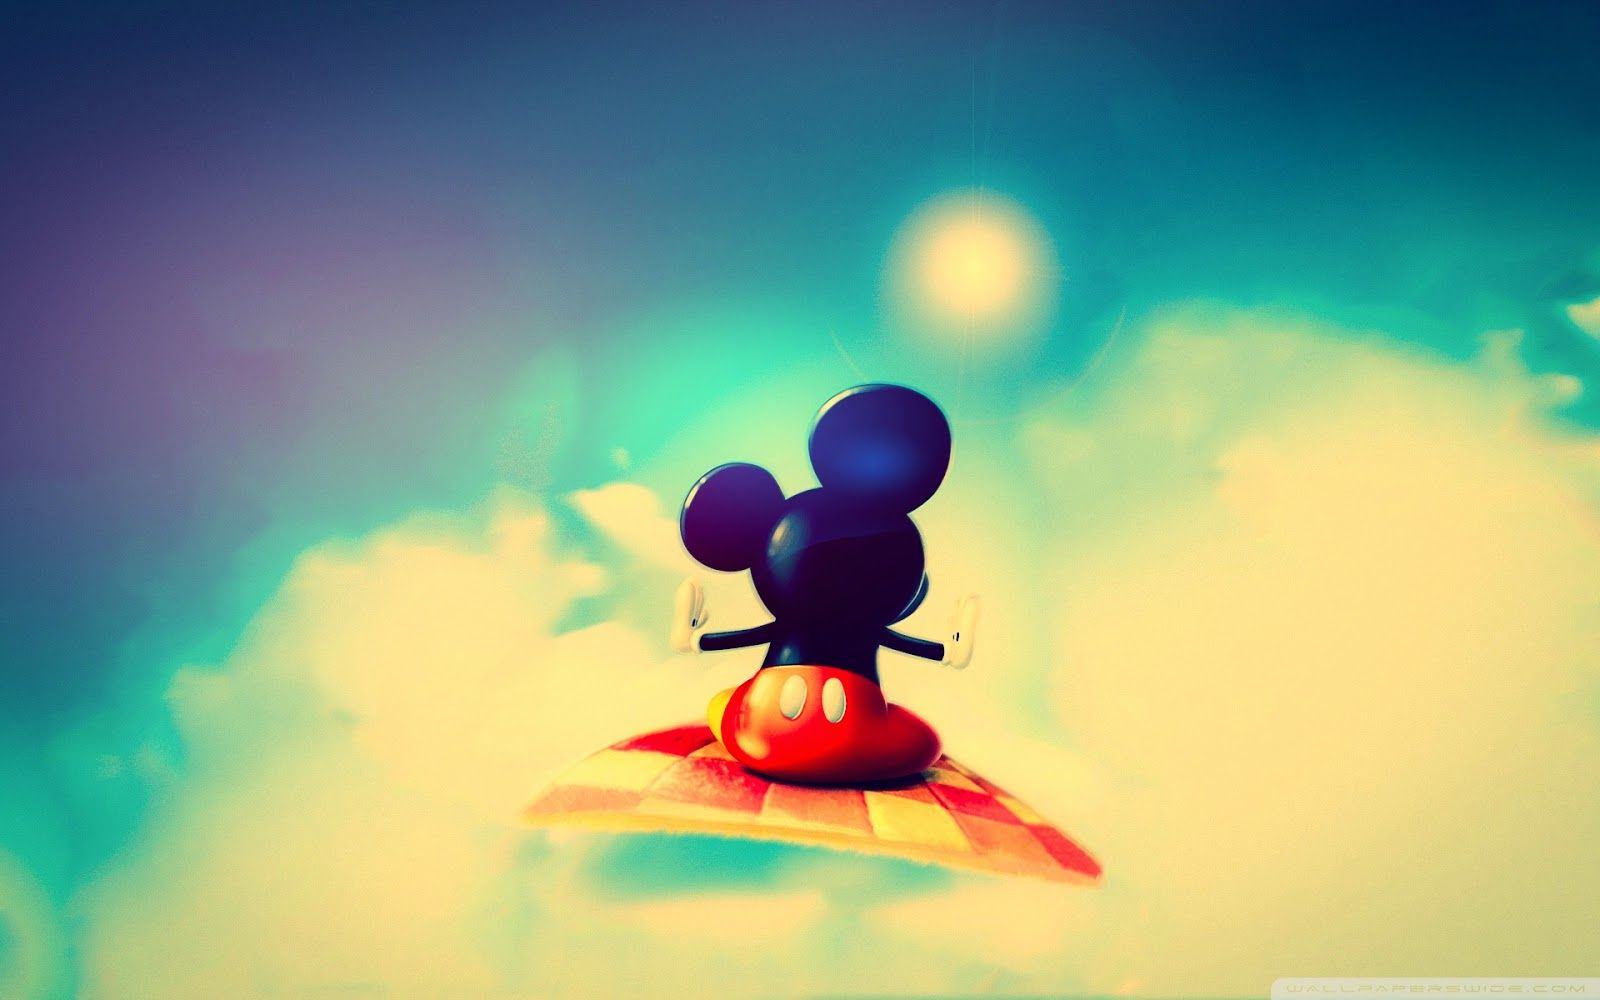 Mickey Mouse Desktop Background Disney Desktop Wallpaper Mickey Mouse Pictures Mickey Mouse Wallpaper